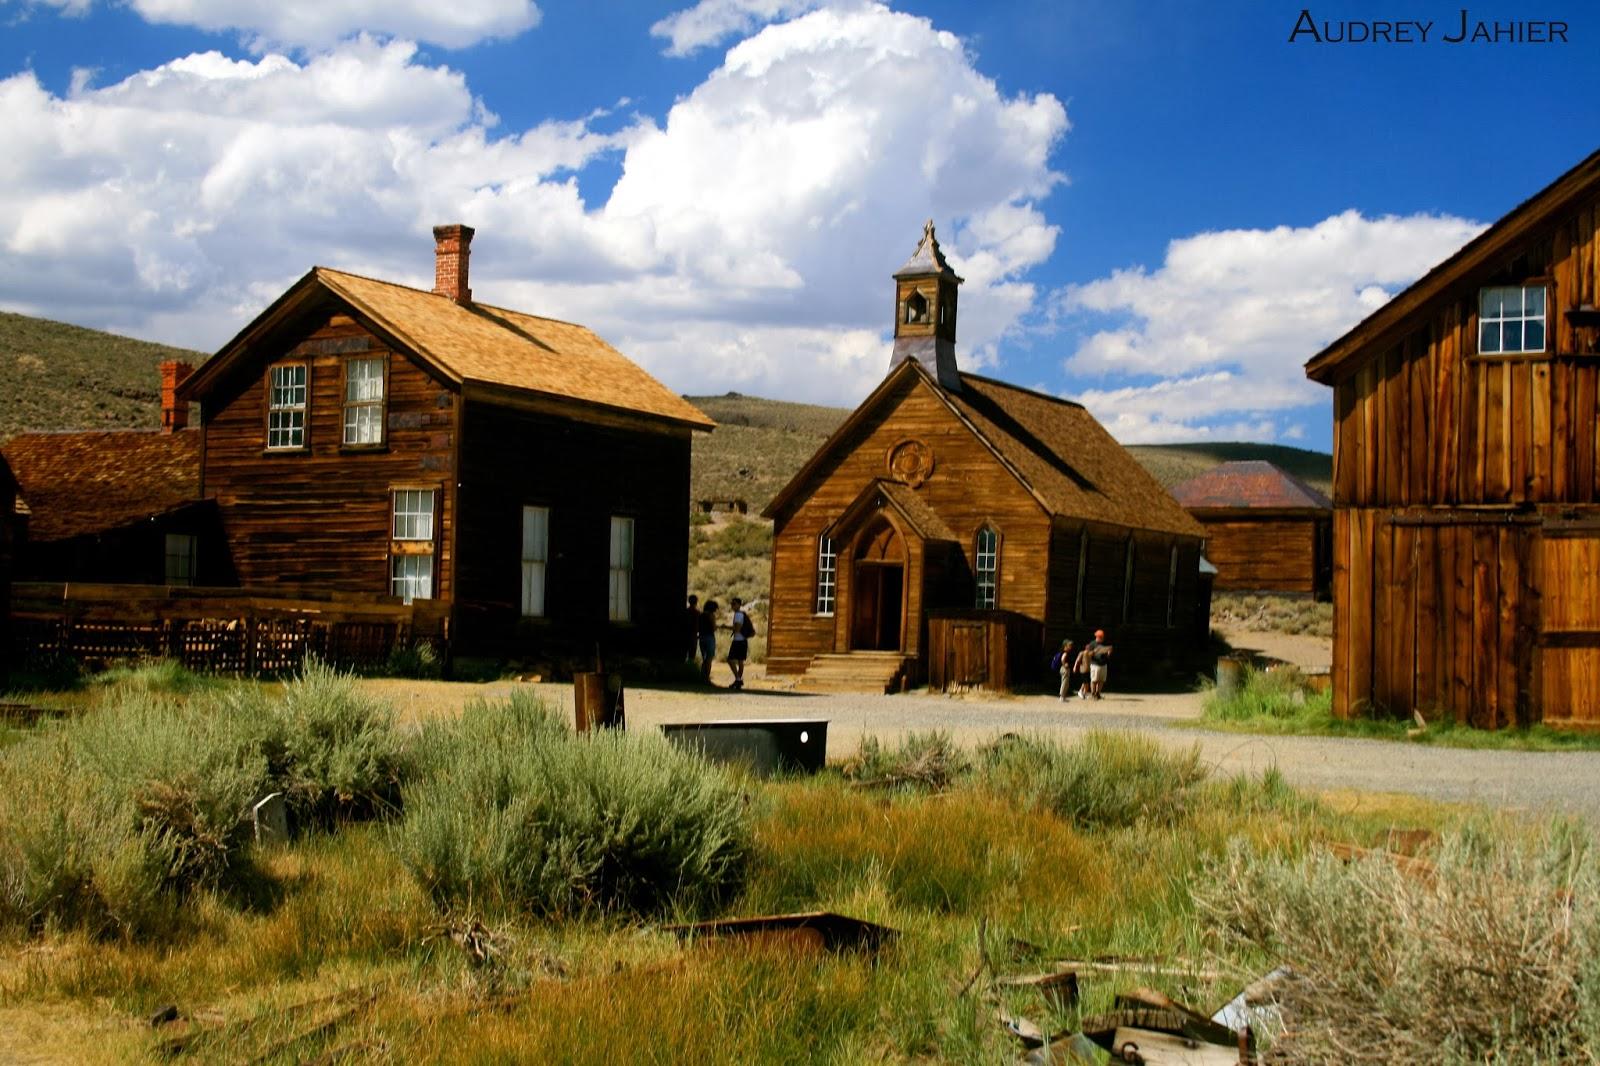 bodie-ghost-town-california-road-trip-USA